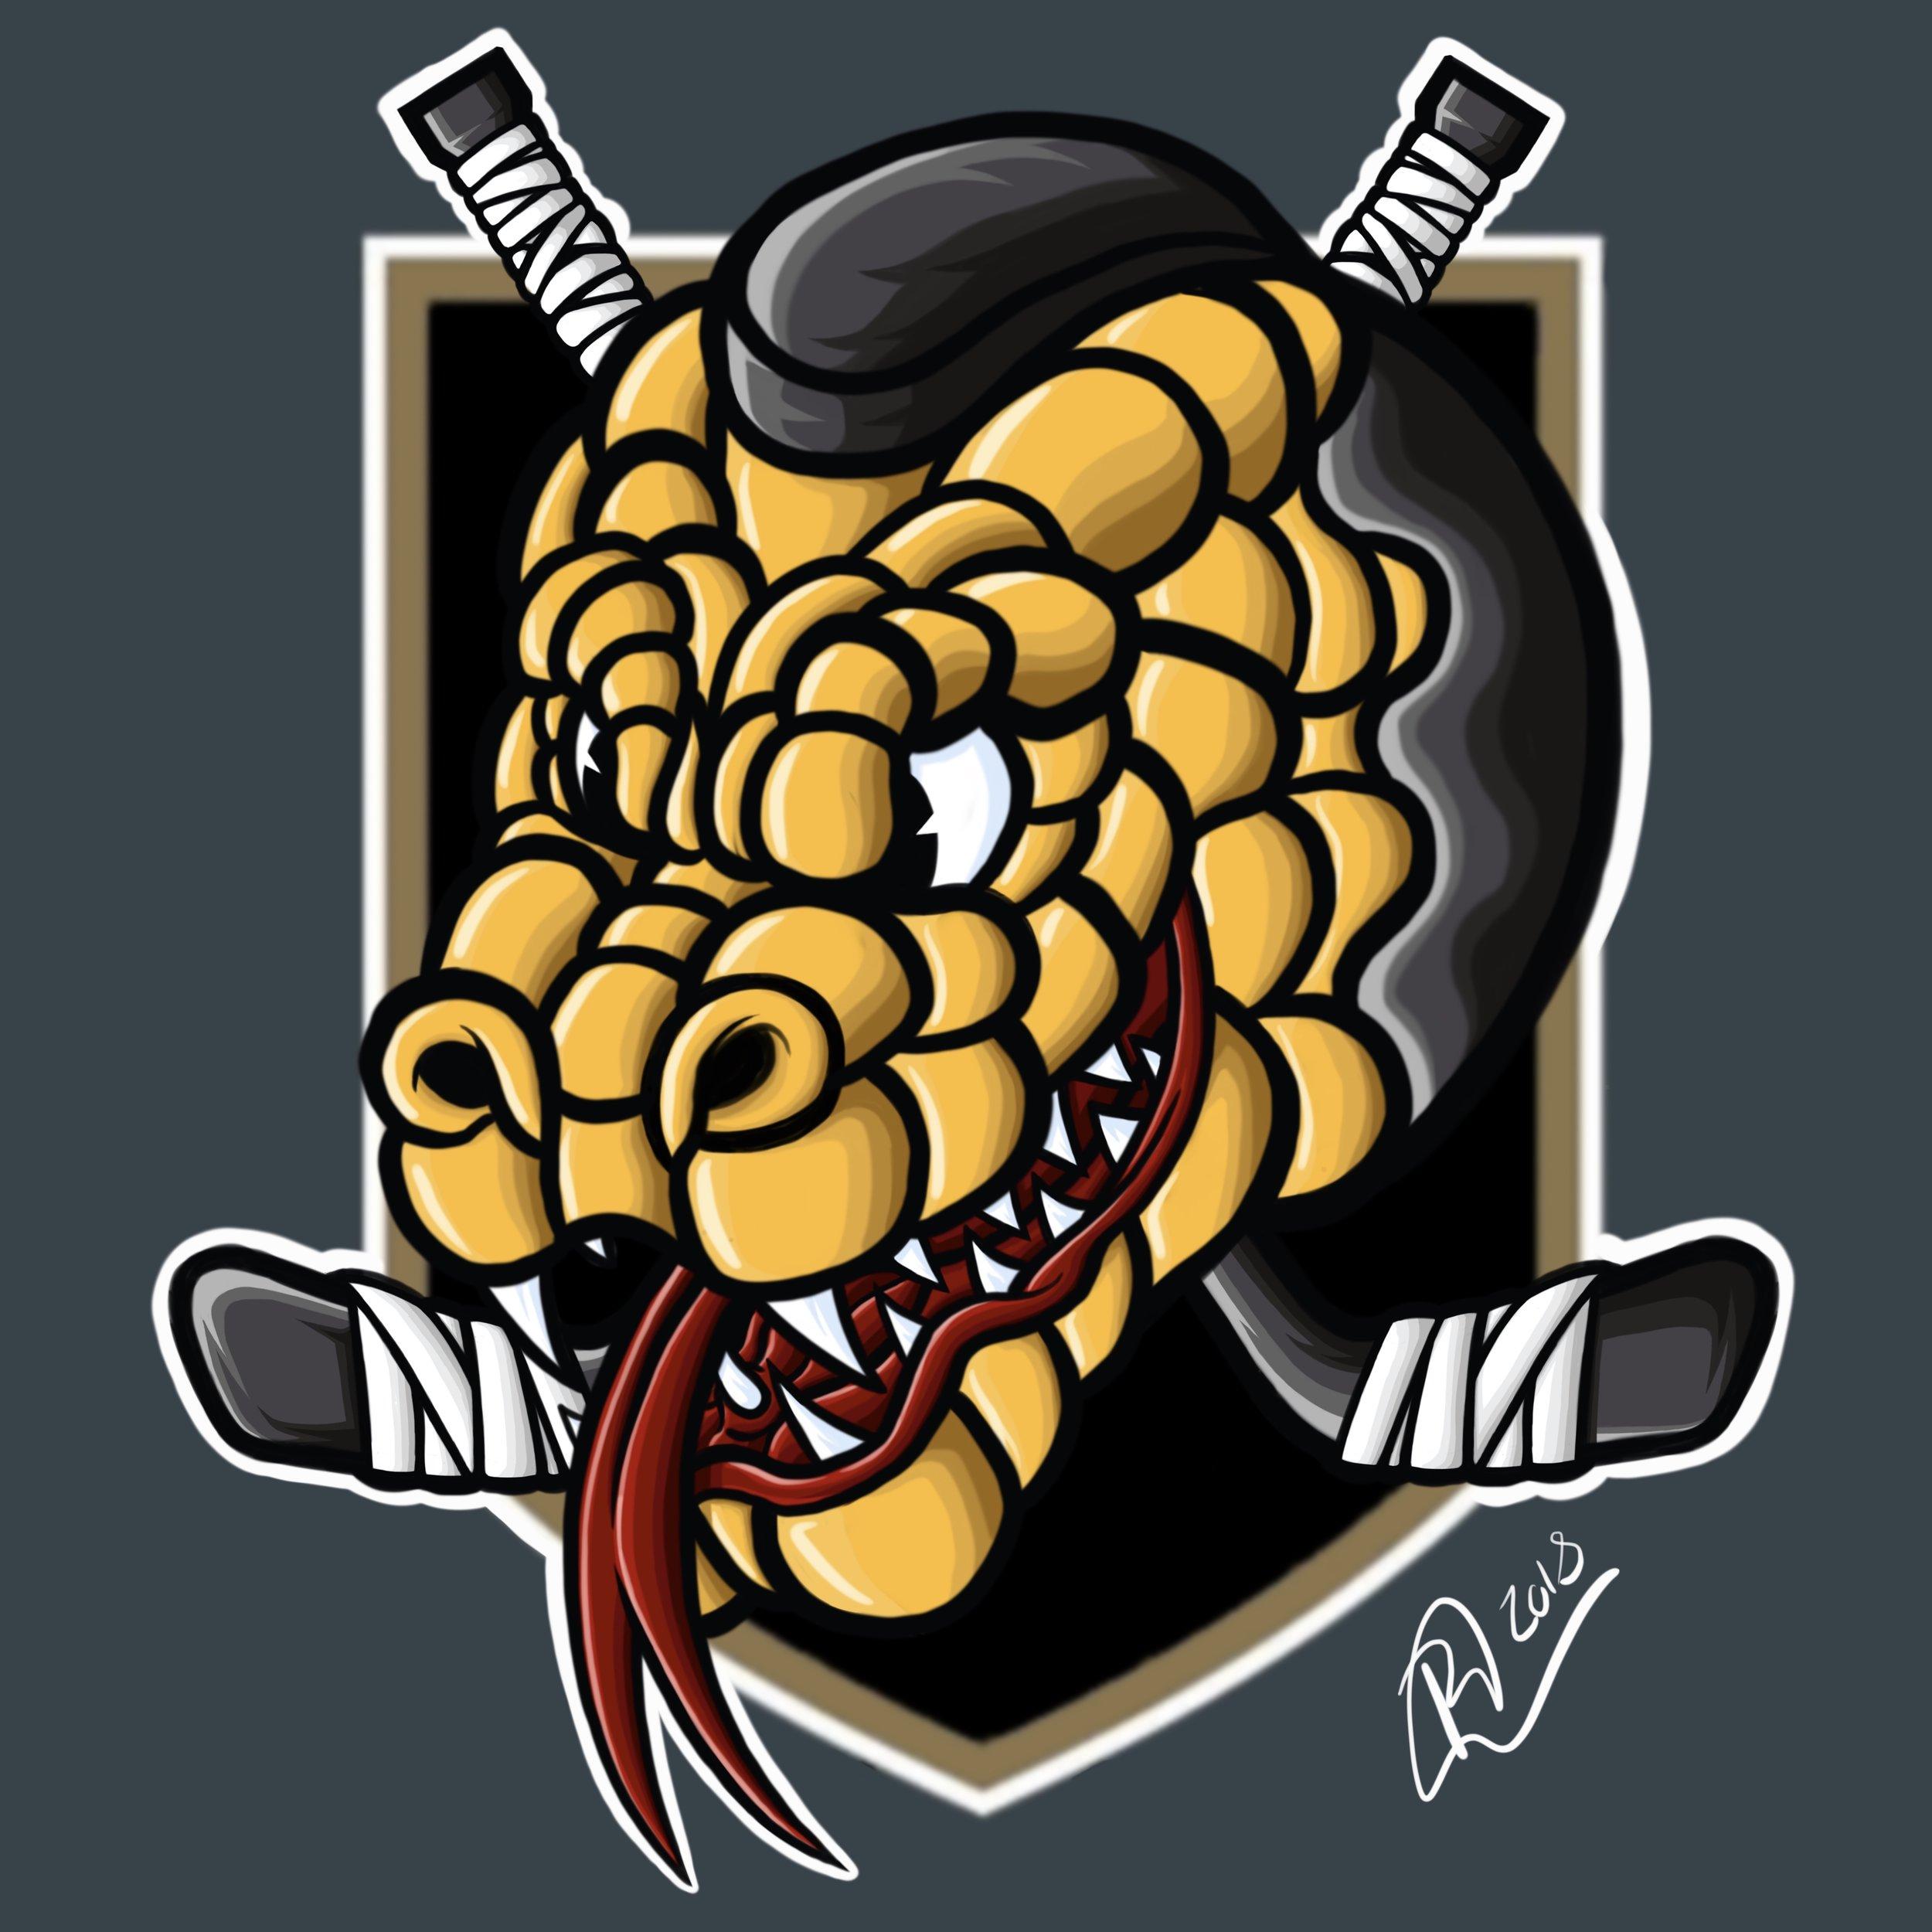 orozcodesign-vegasgoldenknights-chance-mascot-illustration-alternate.jpg